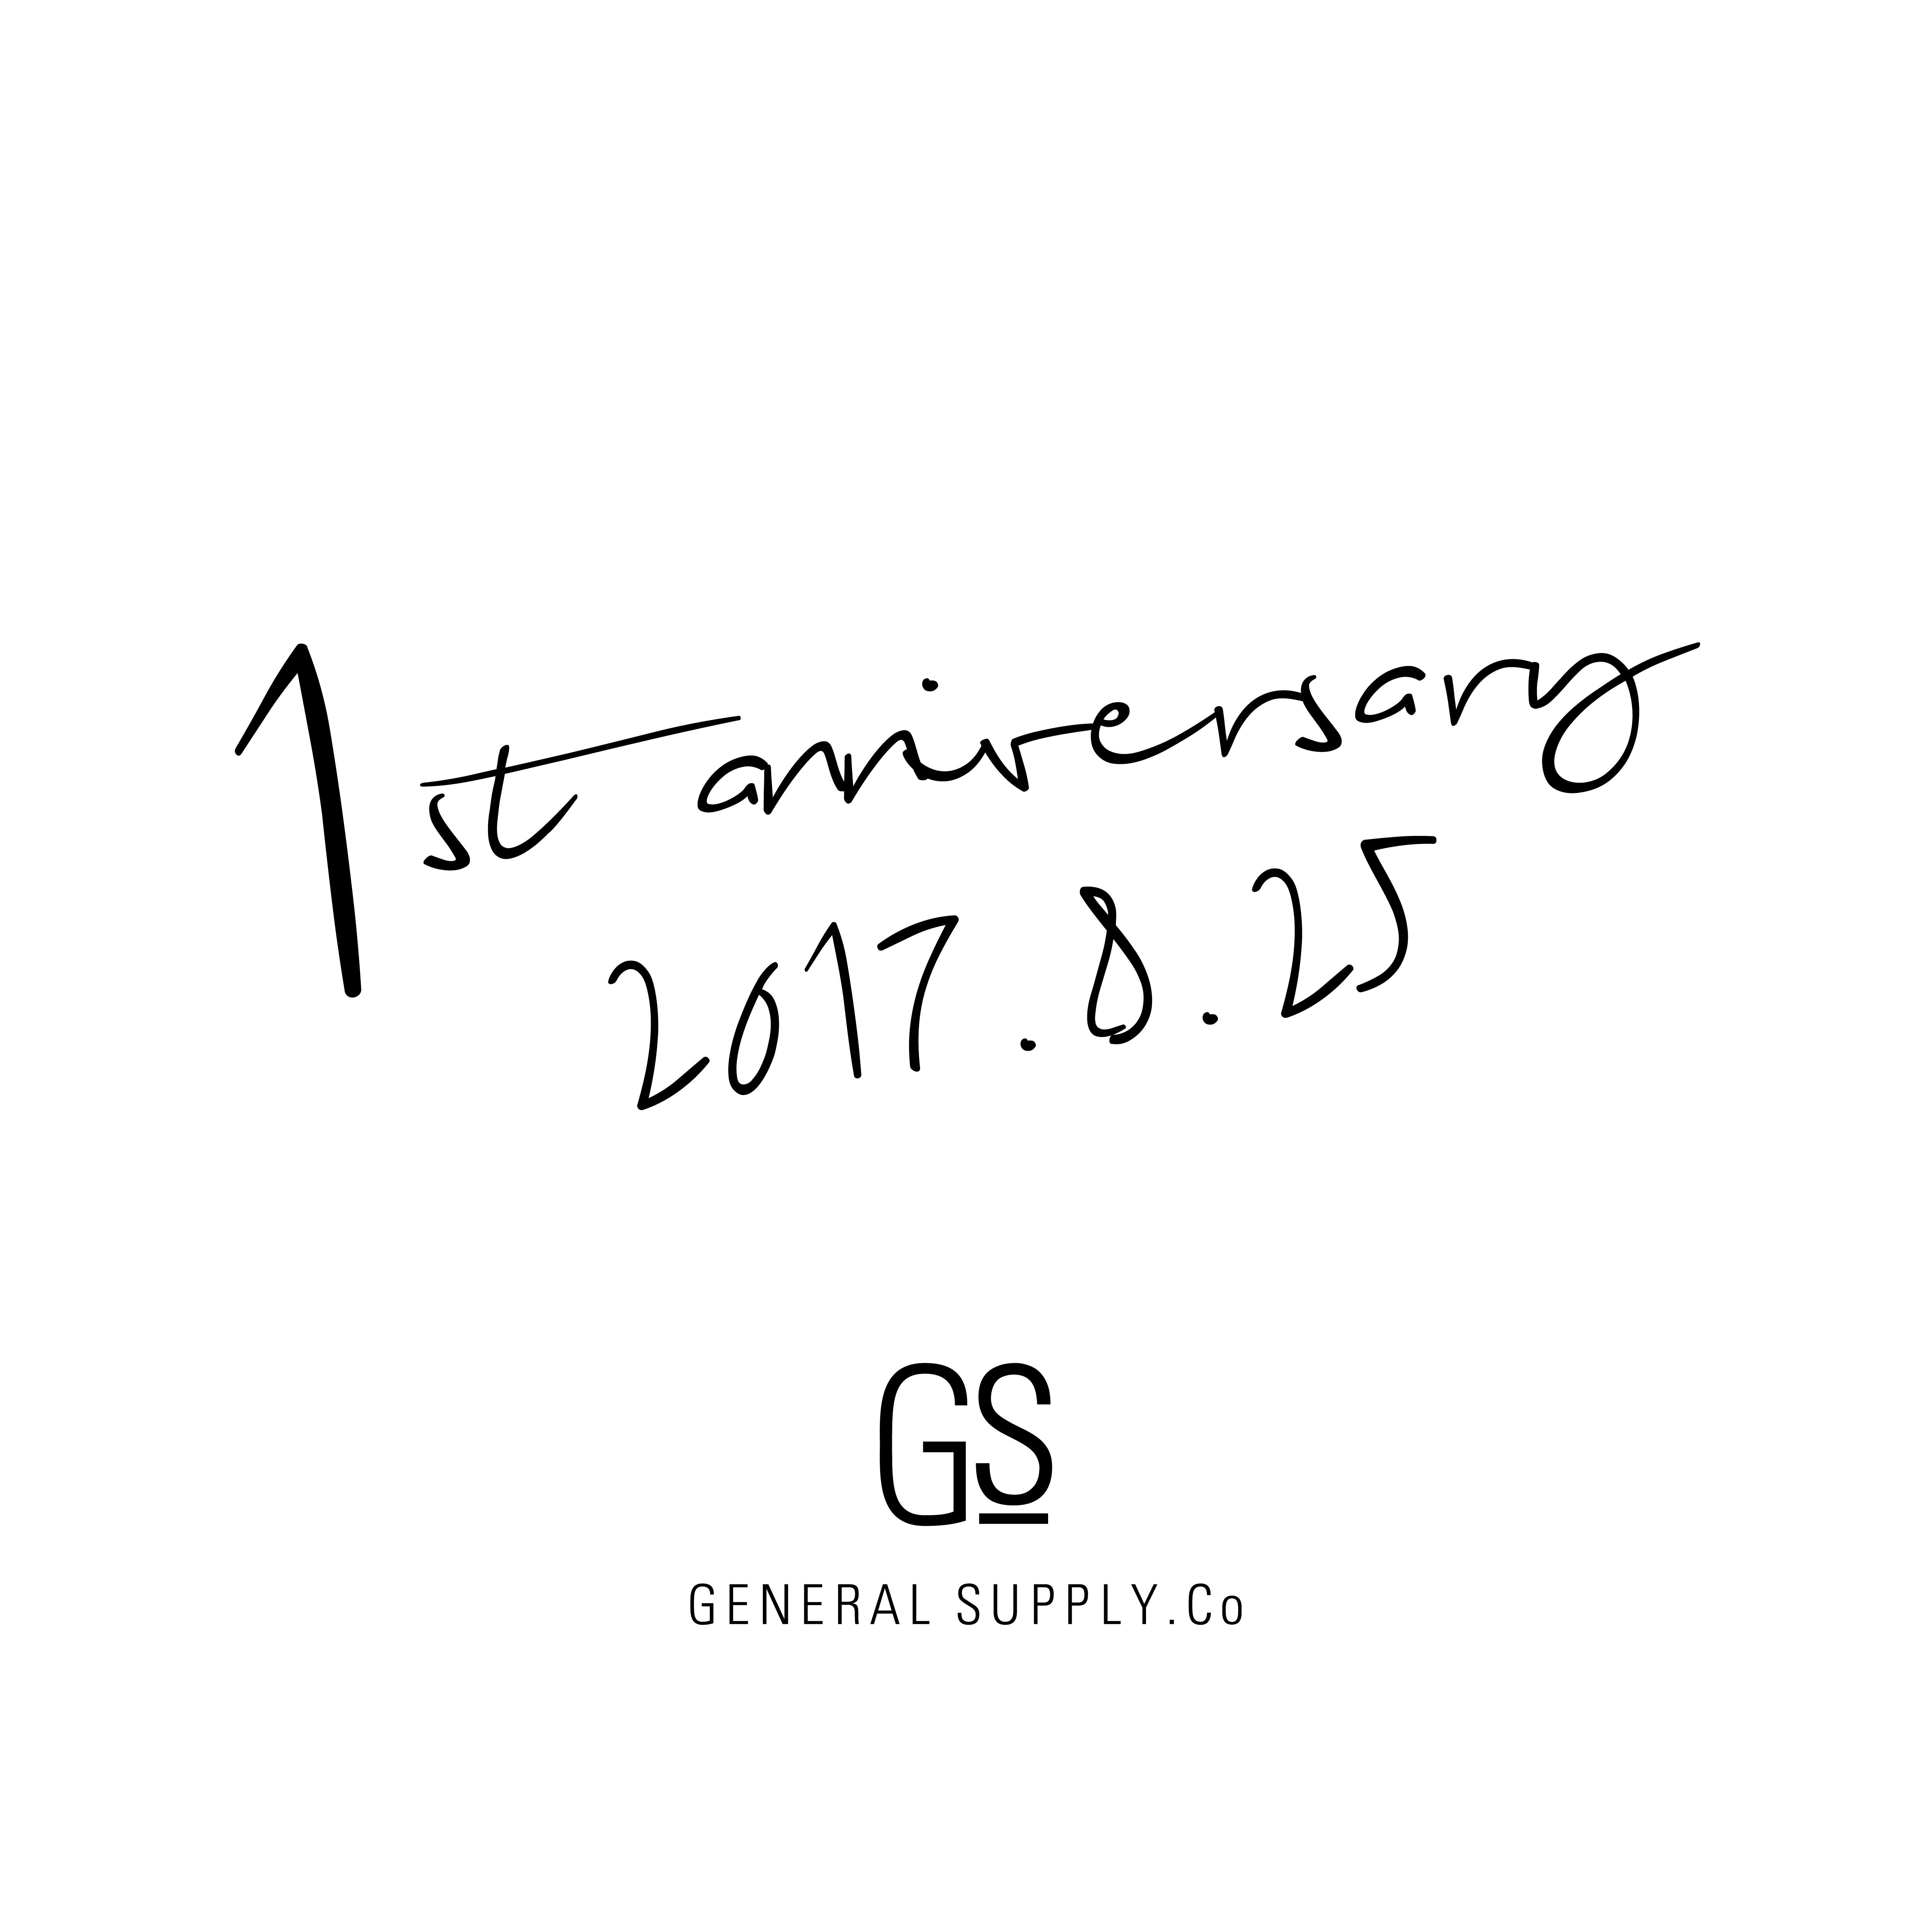 GENERAL SUPPLY 1st Anniversary